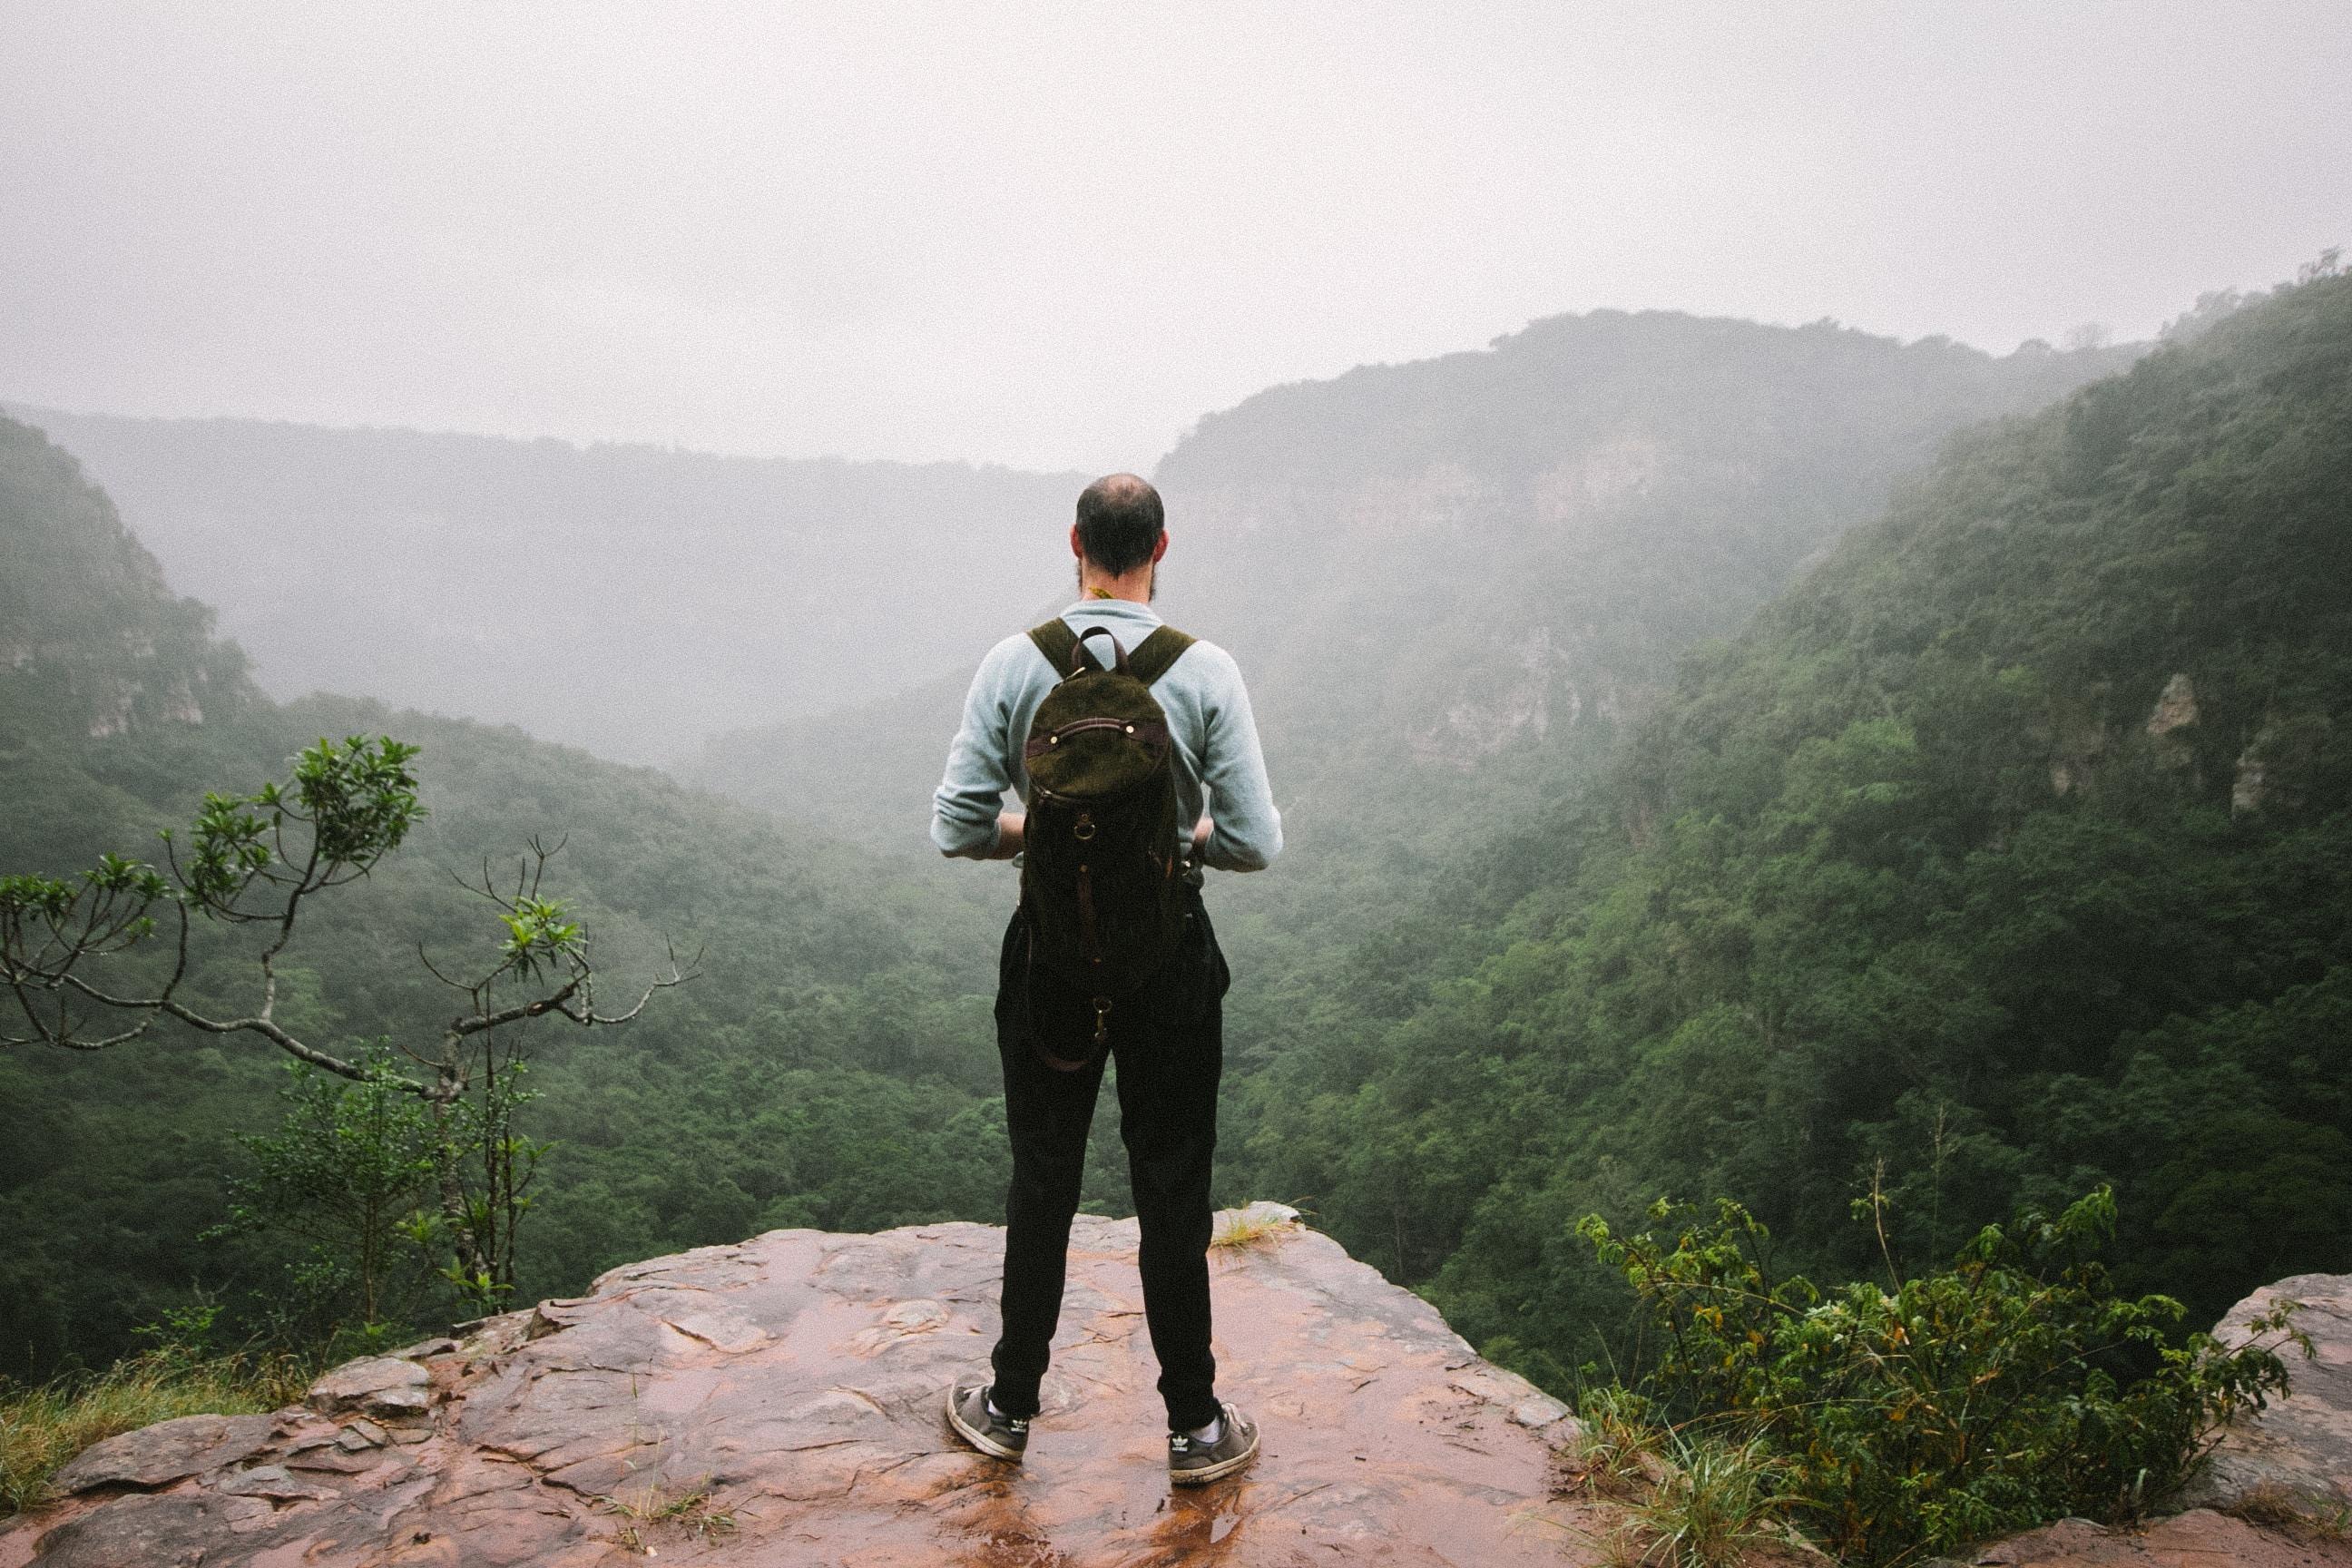 man standing near cliff overlook mountains